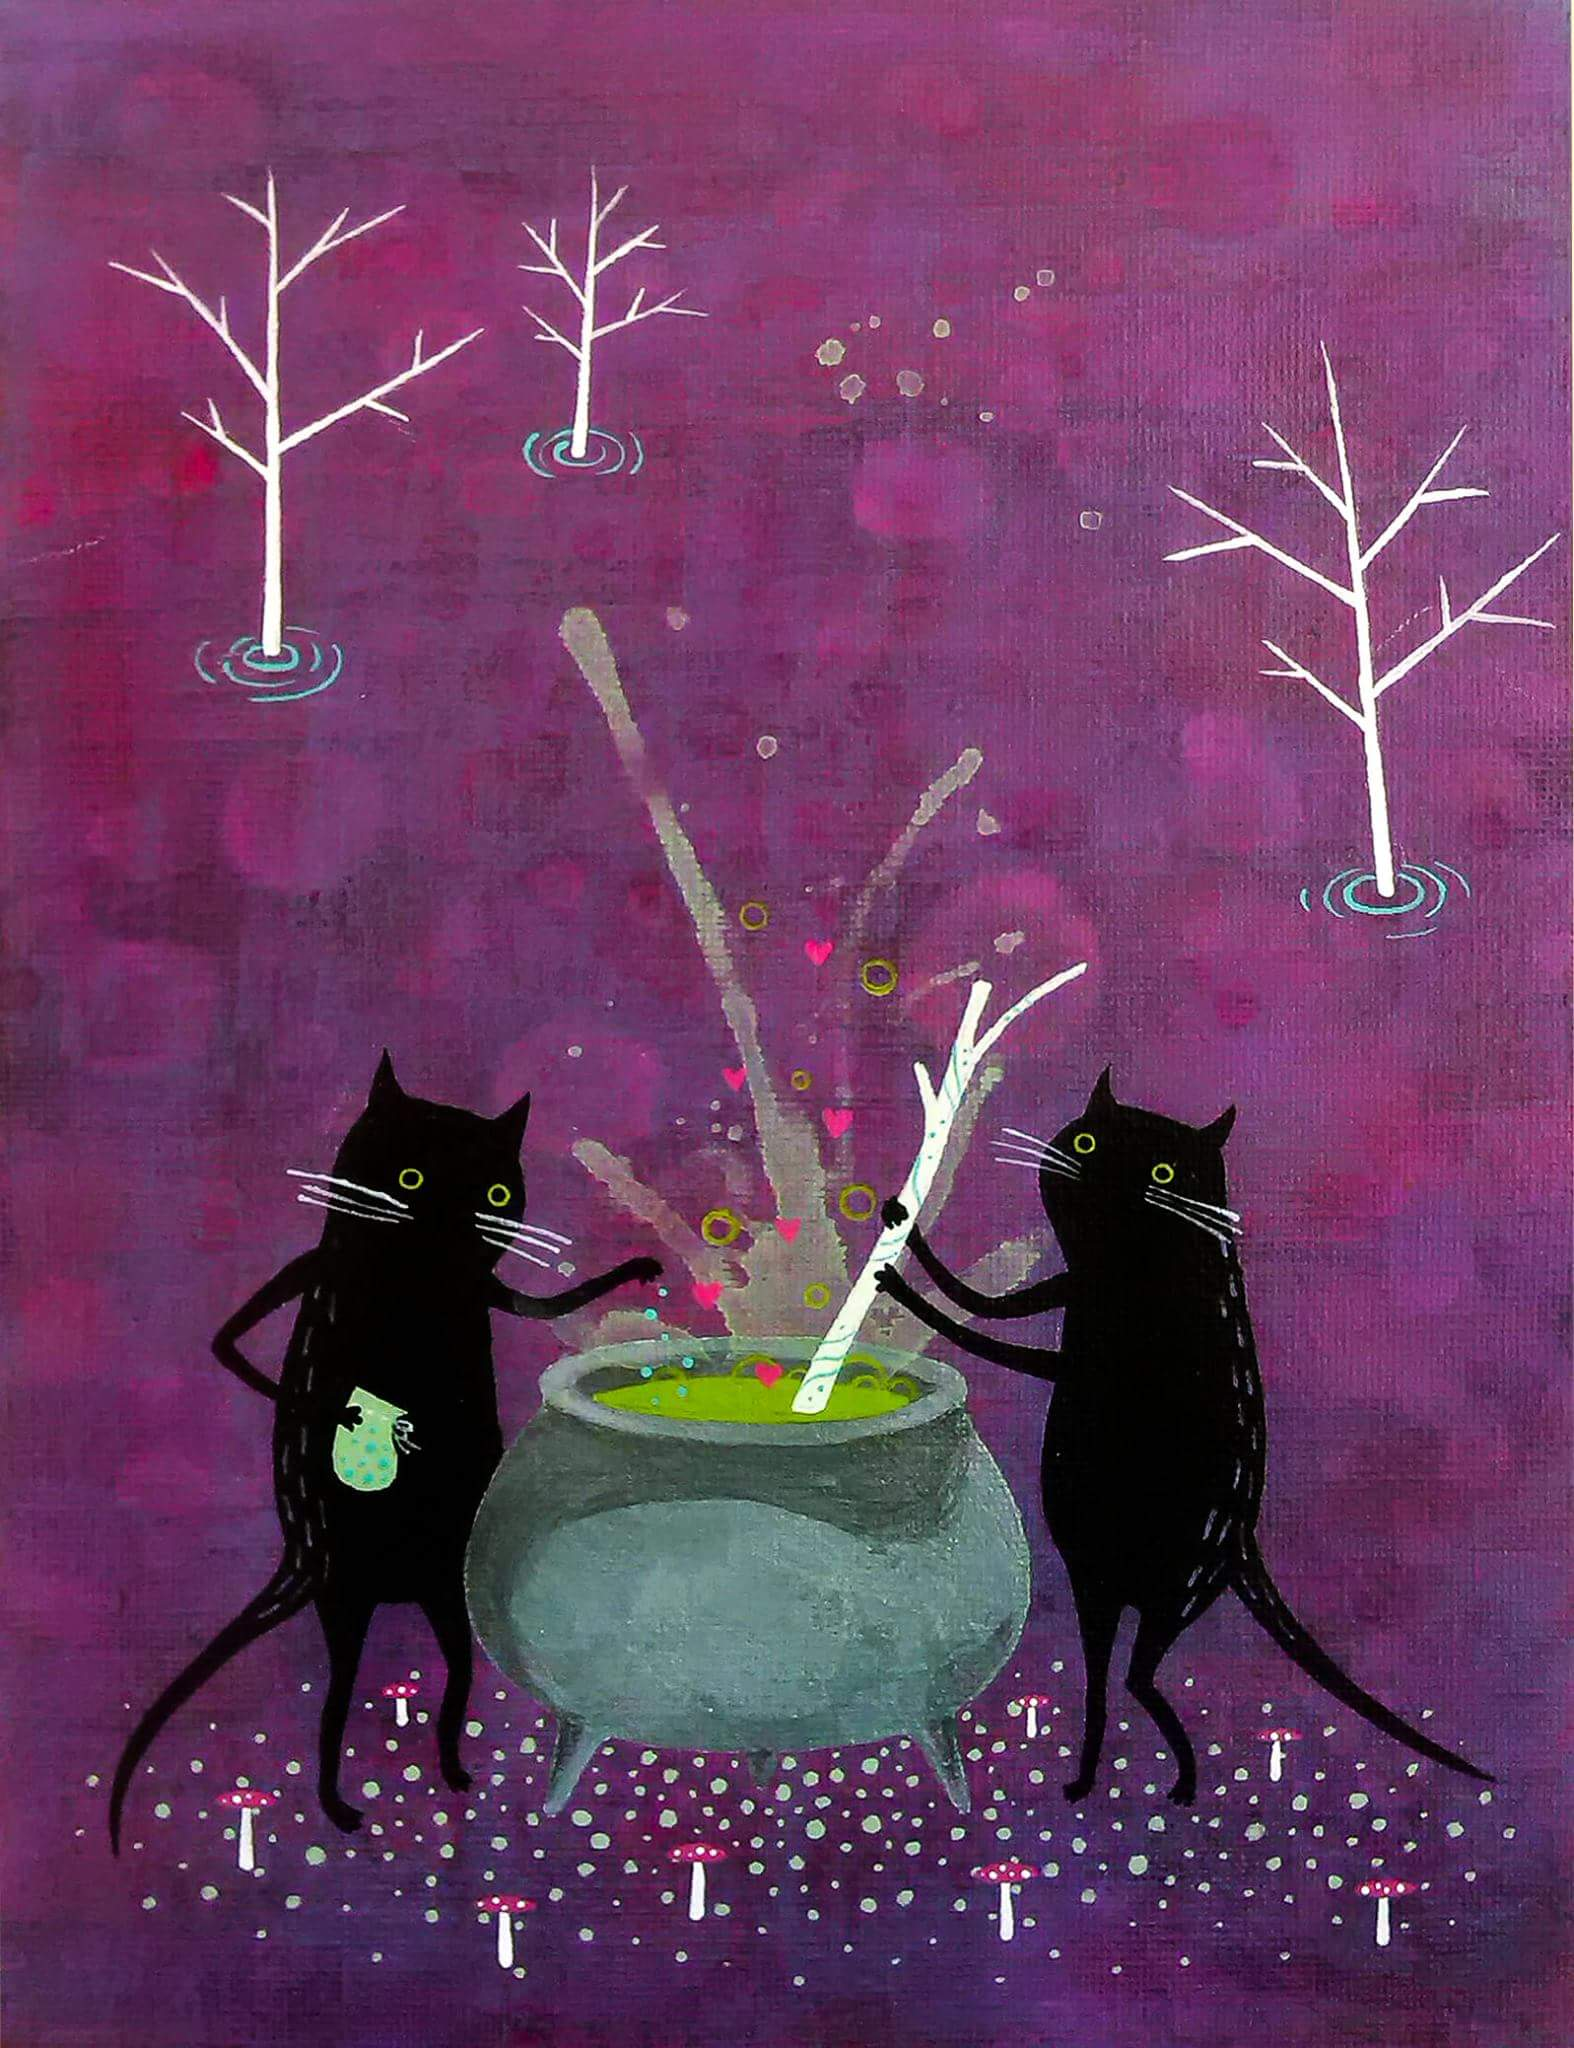 stvarno mokra crna maca